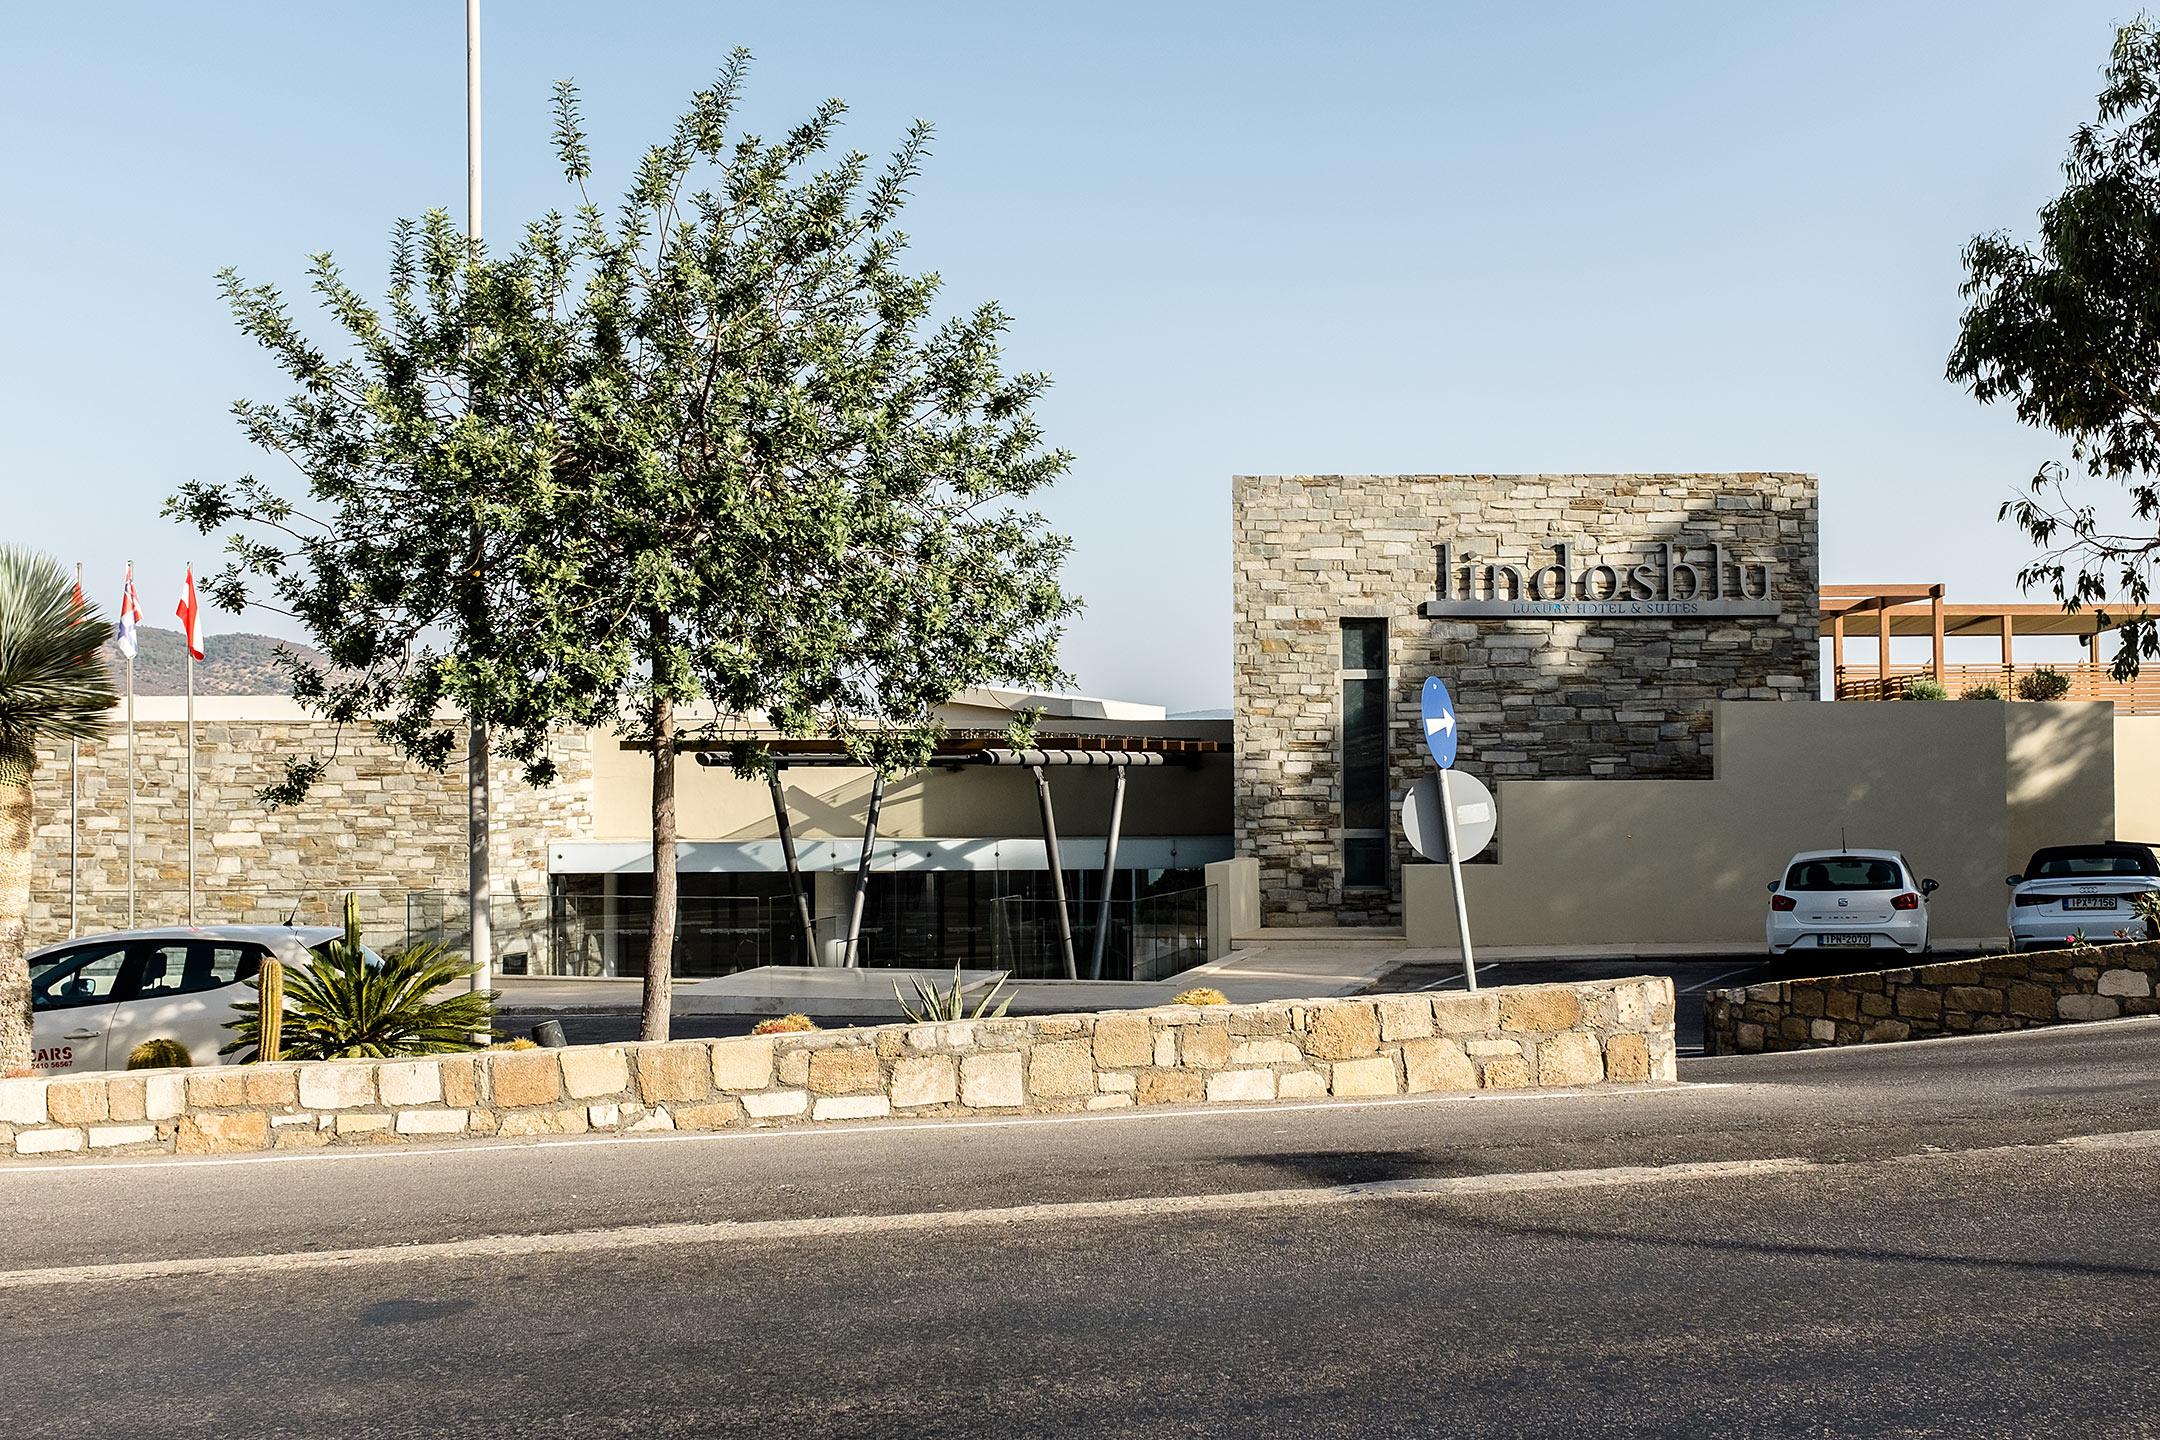 Lindos Blu Luxury Hotel Rhodos Strasse Travel Blog Sunnyinga